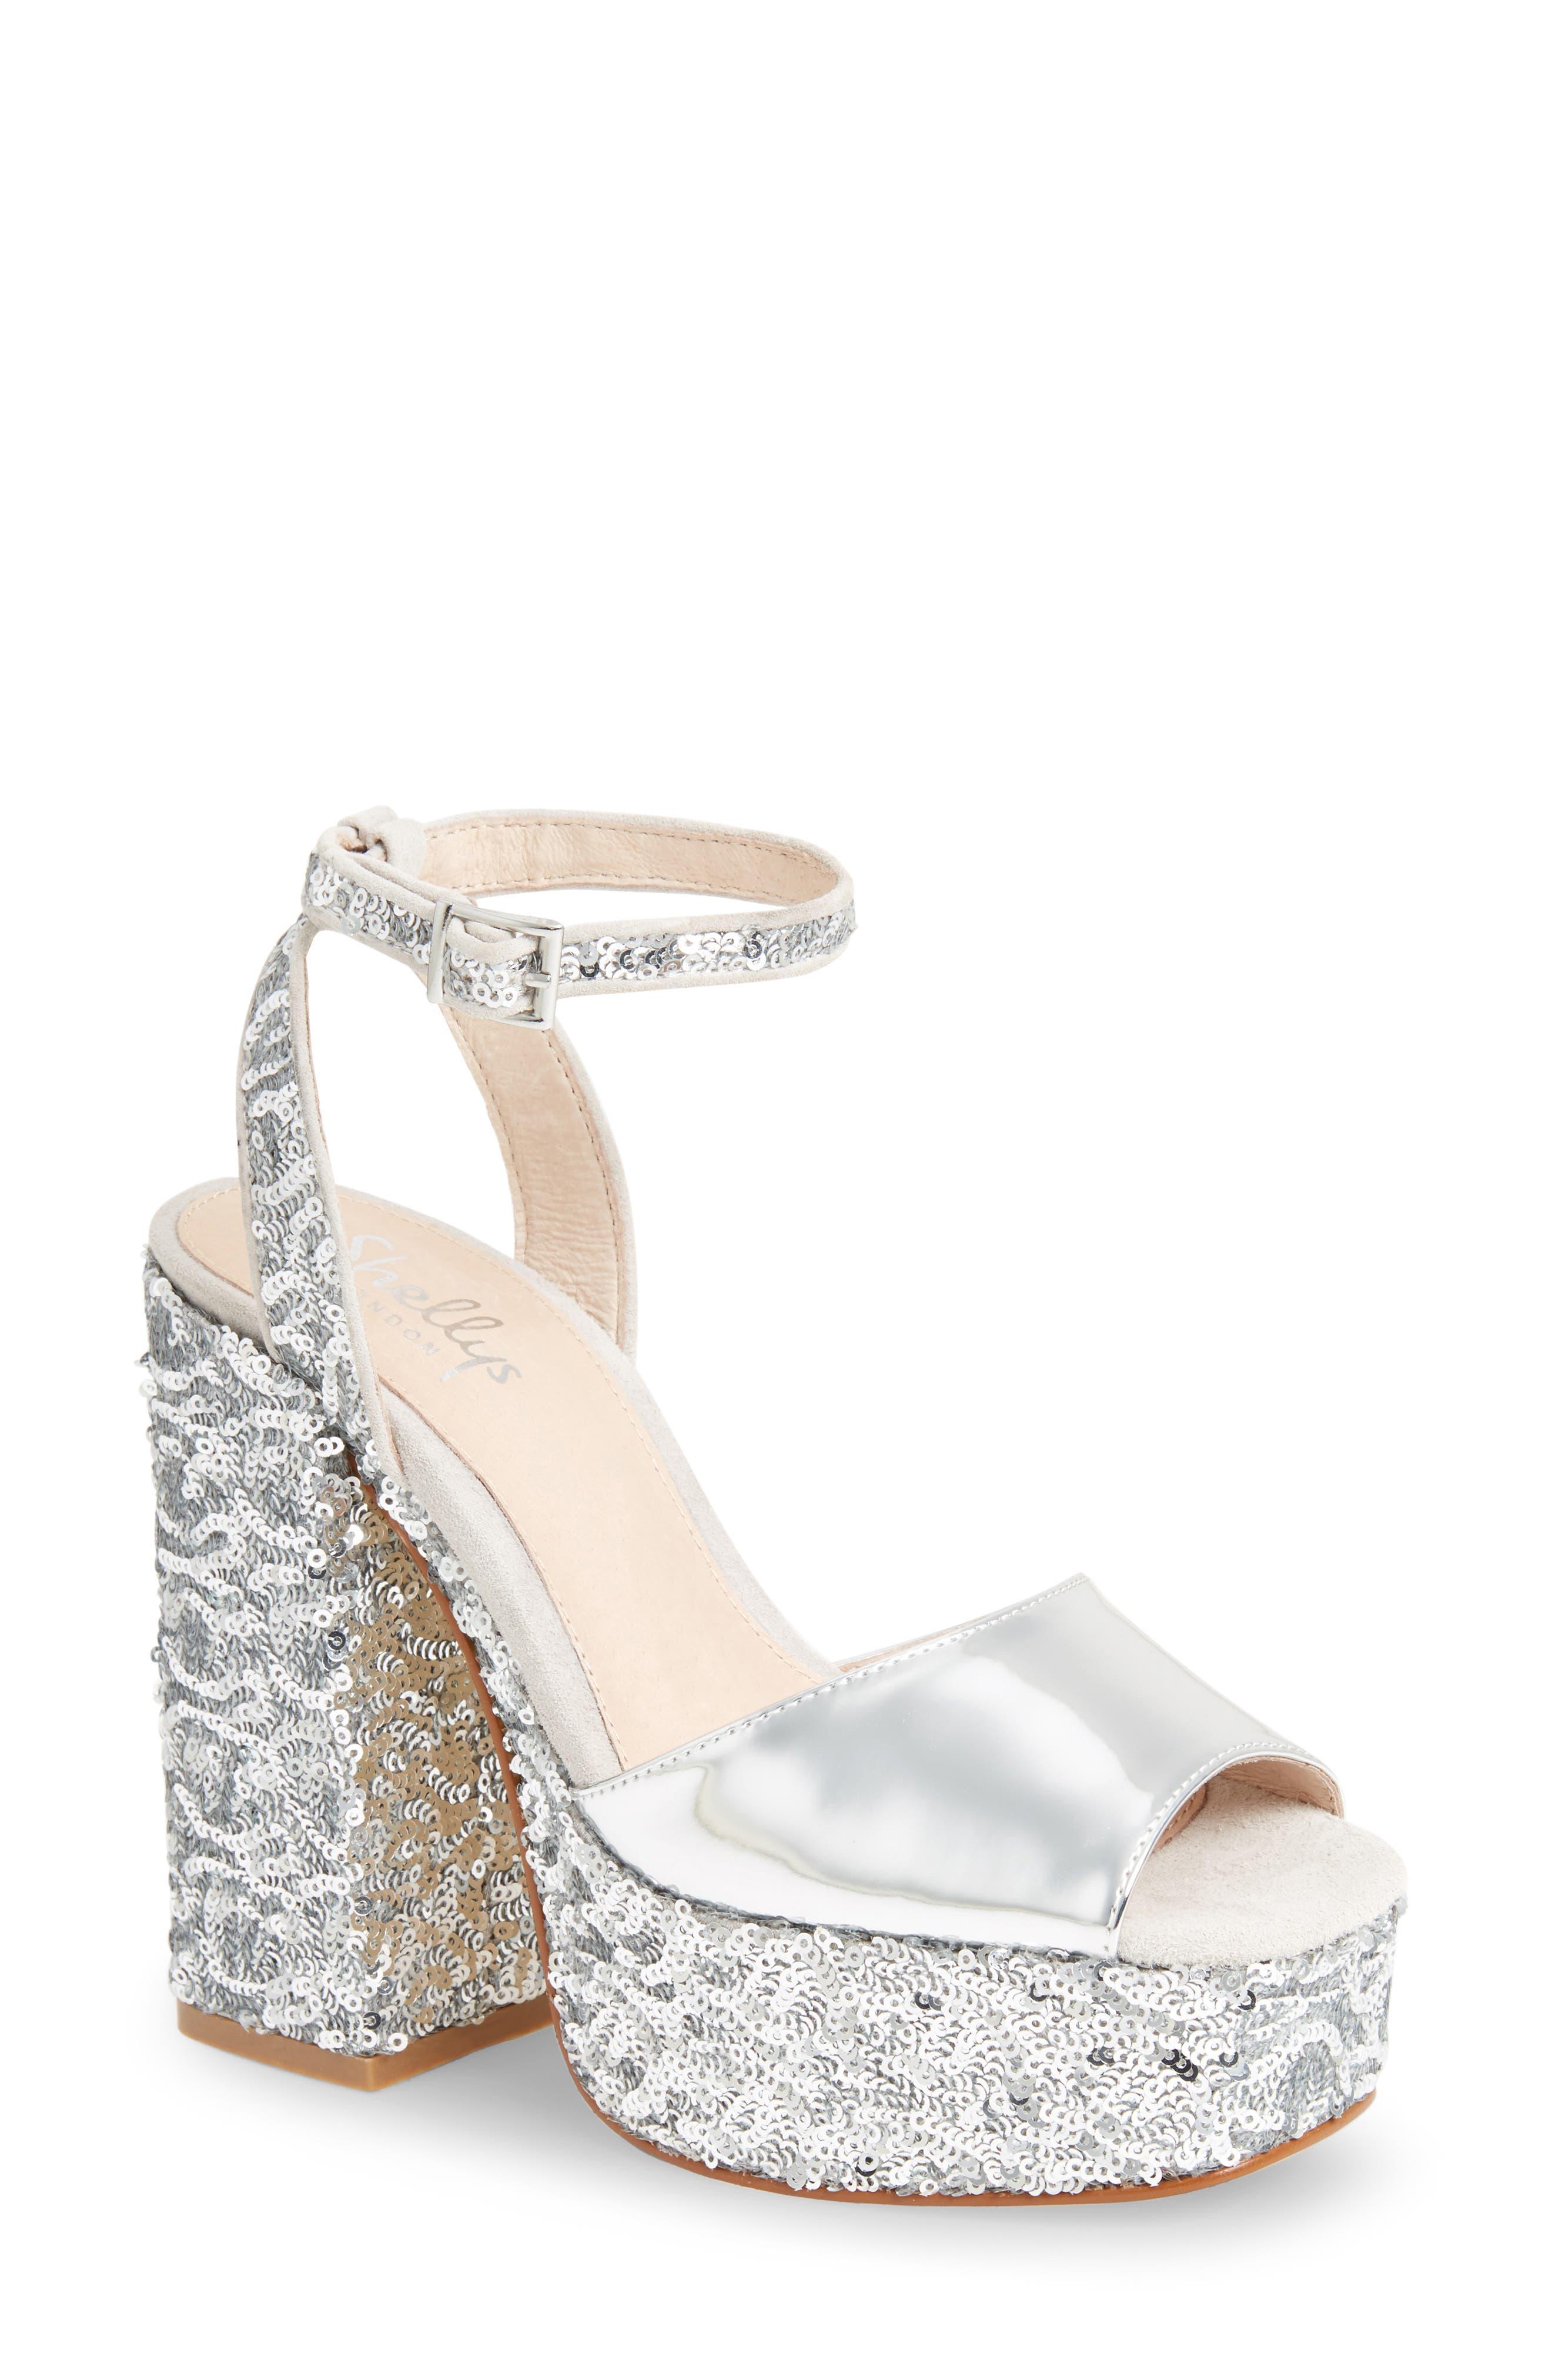 Alternate Image 1 Selected - Shellys London Dena Sequin Platform Sandal (Women)